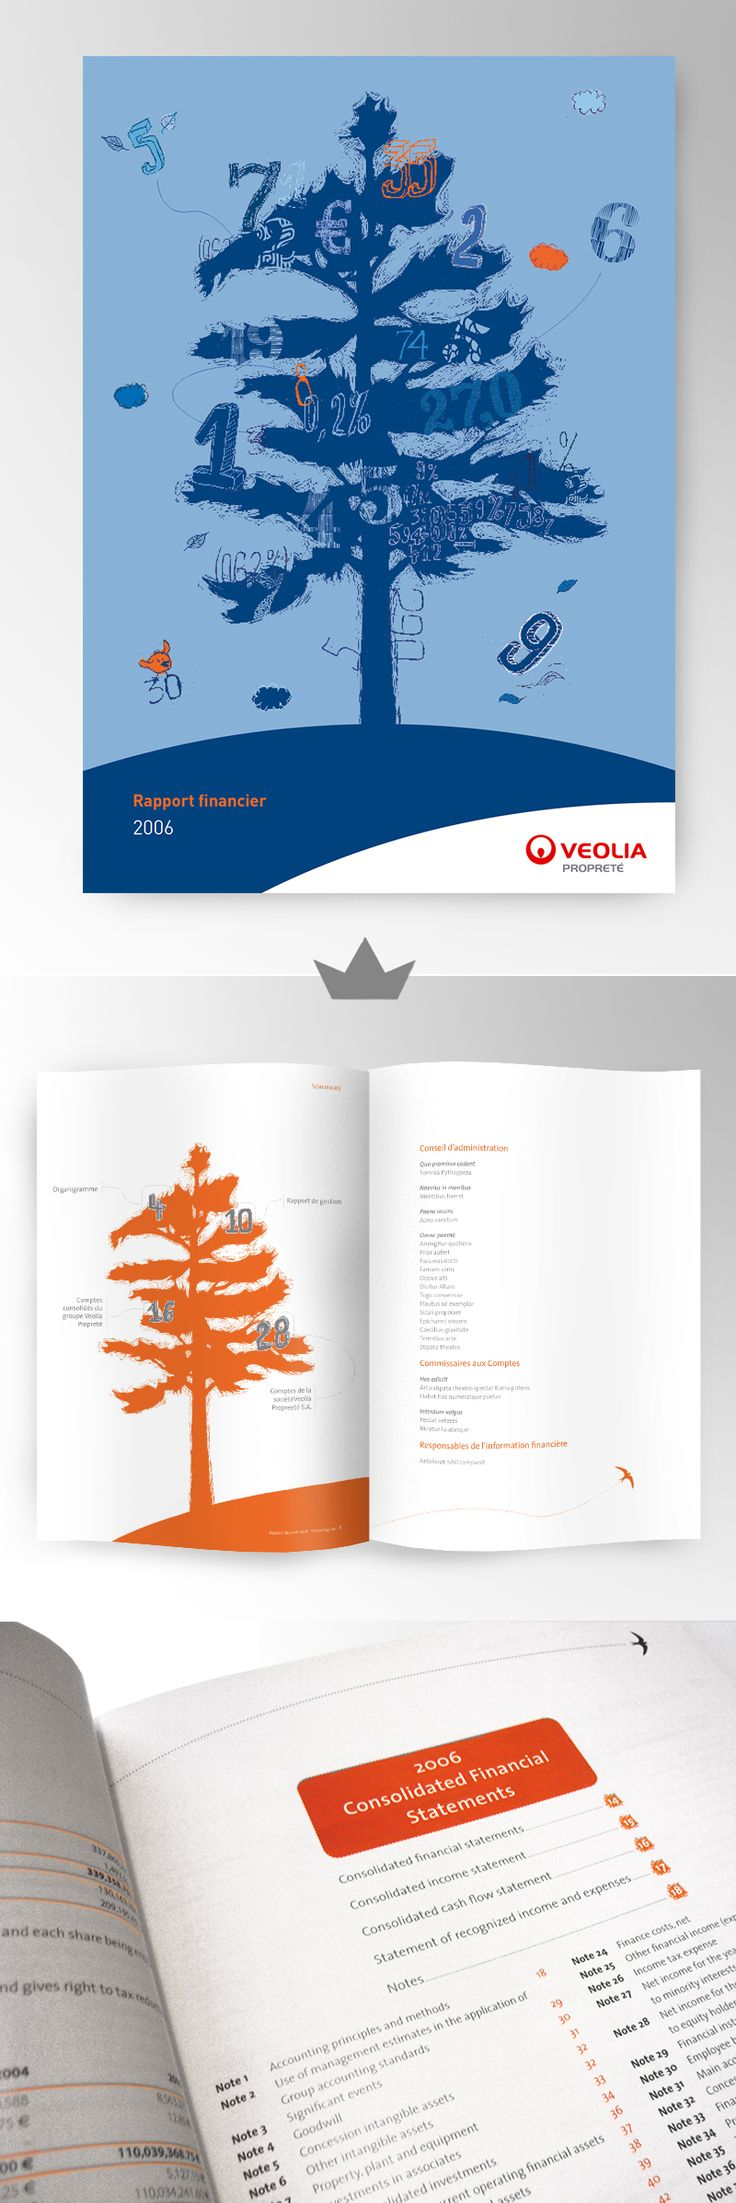 VEOLIA - Rapport annuel 2006  (Rapport financier)